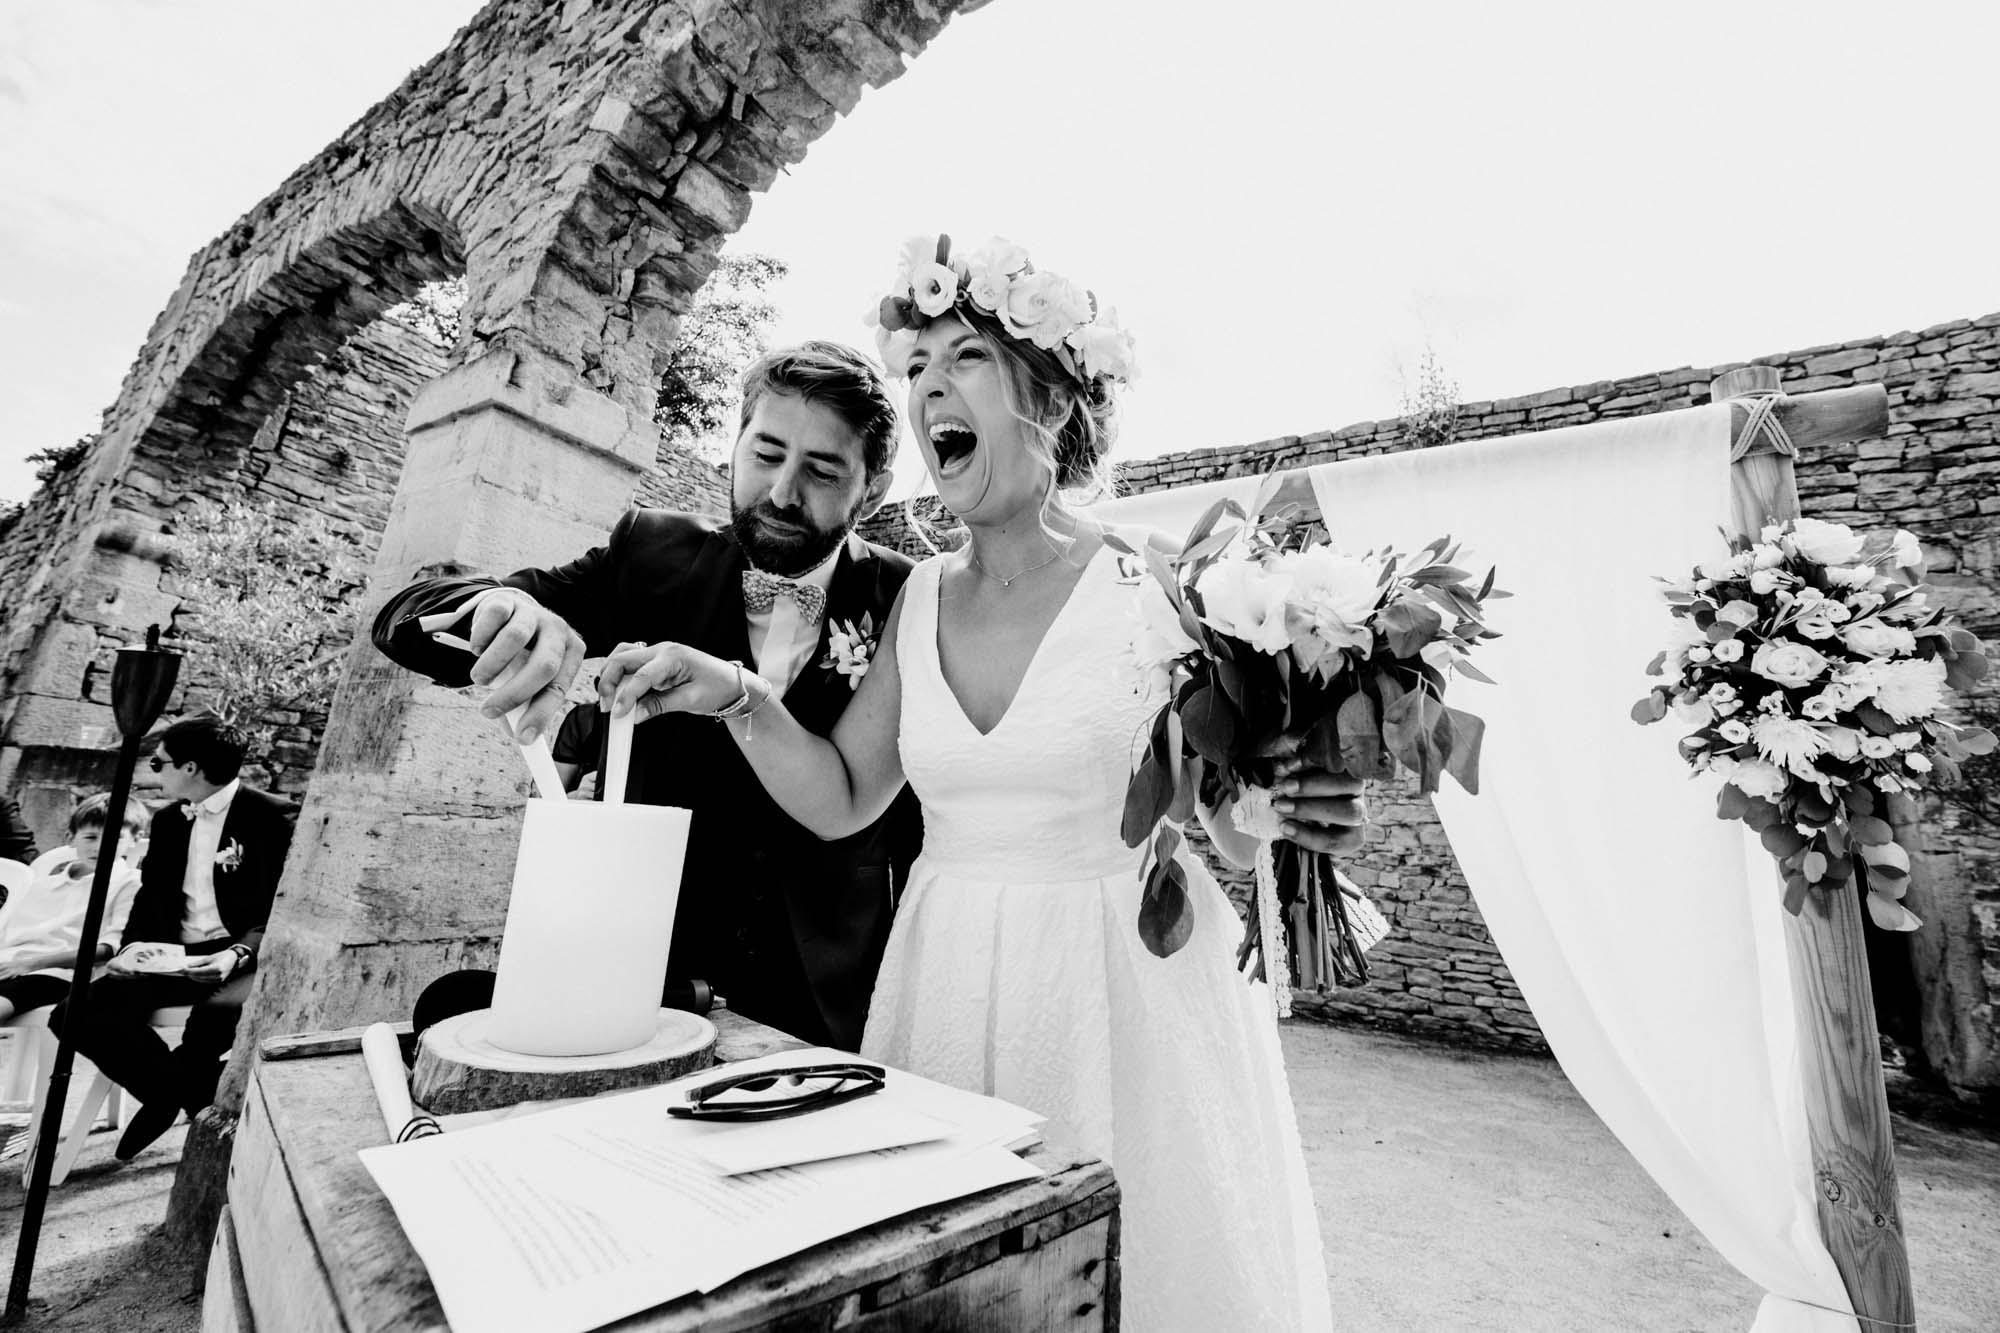 2018-07-21 - LD8_9876 - photographe mariage lyon - laurie diaz - www.lauriediazweeding.com.jpg